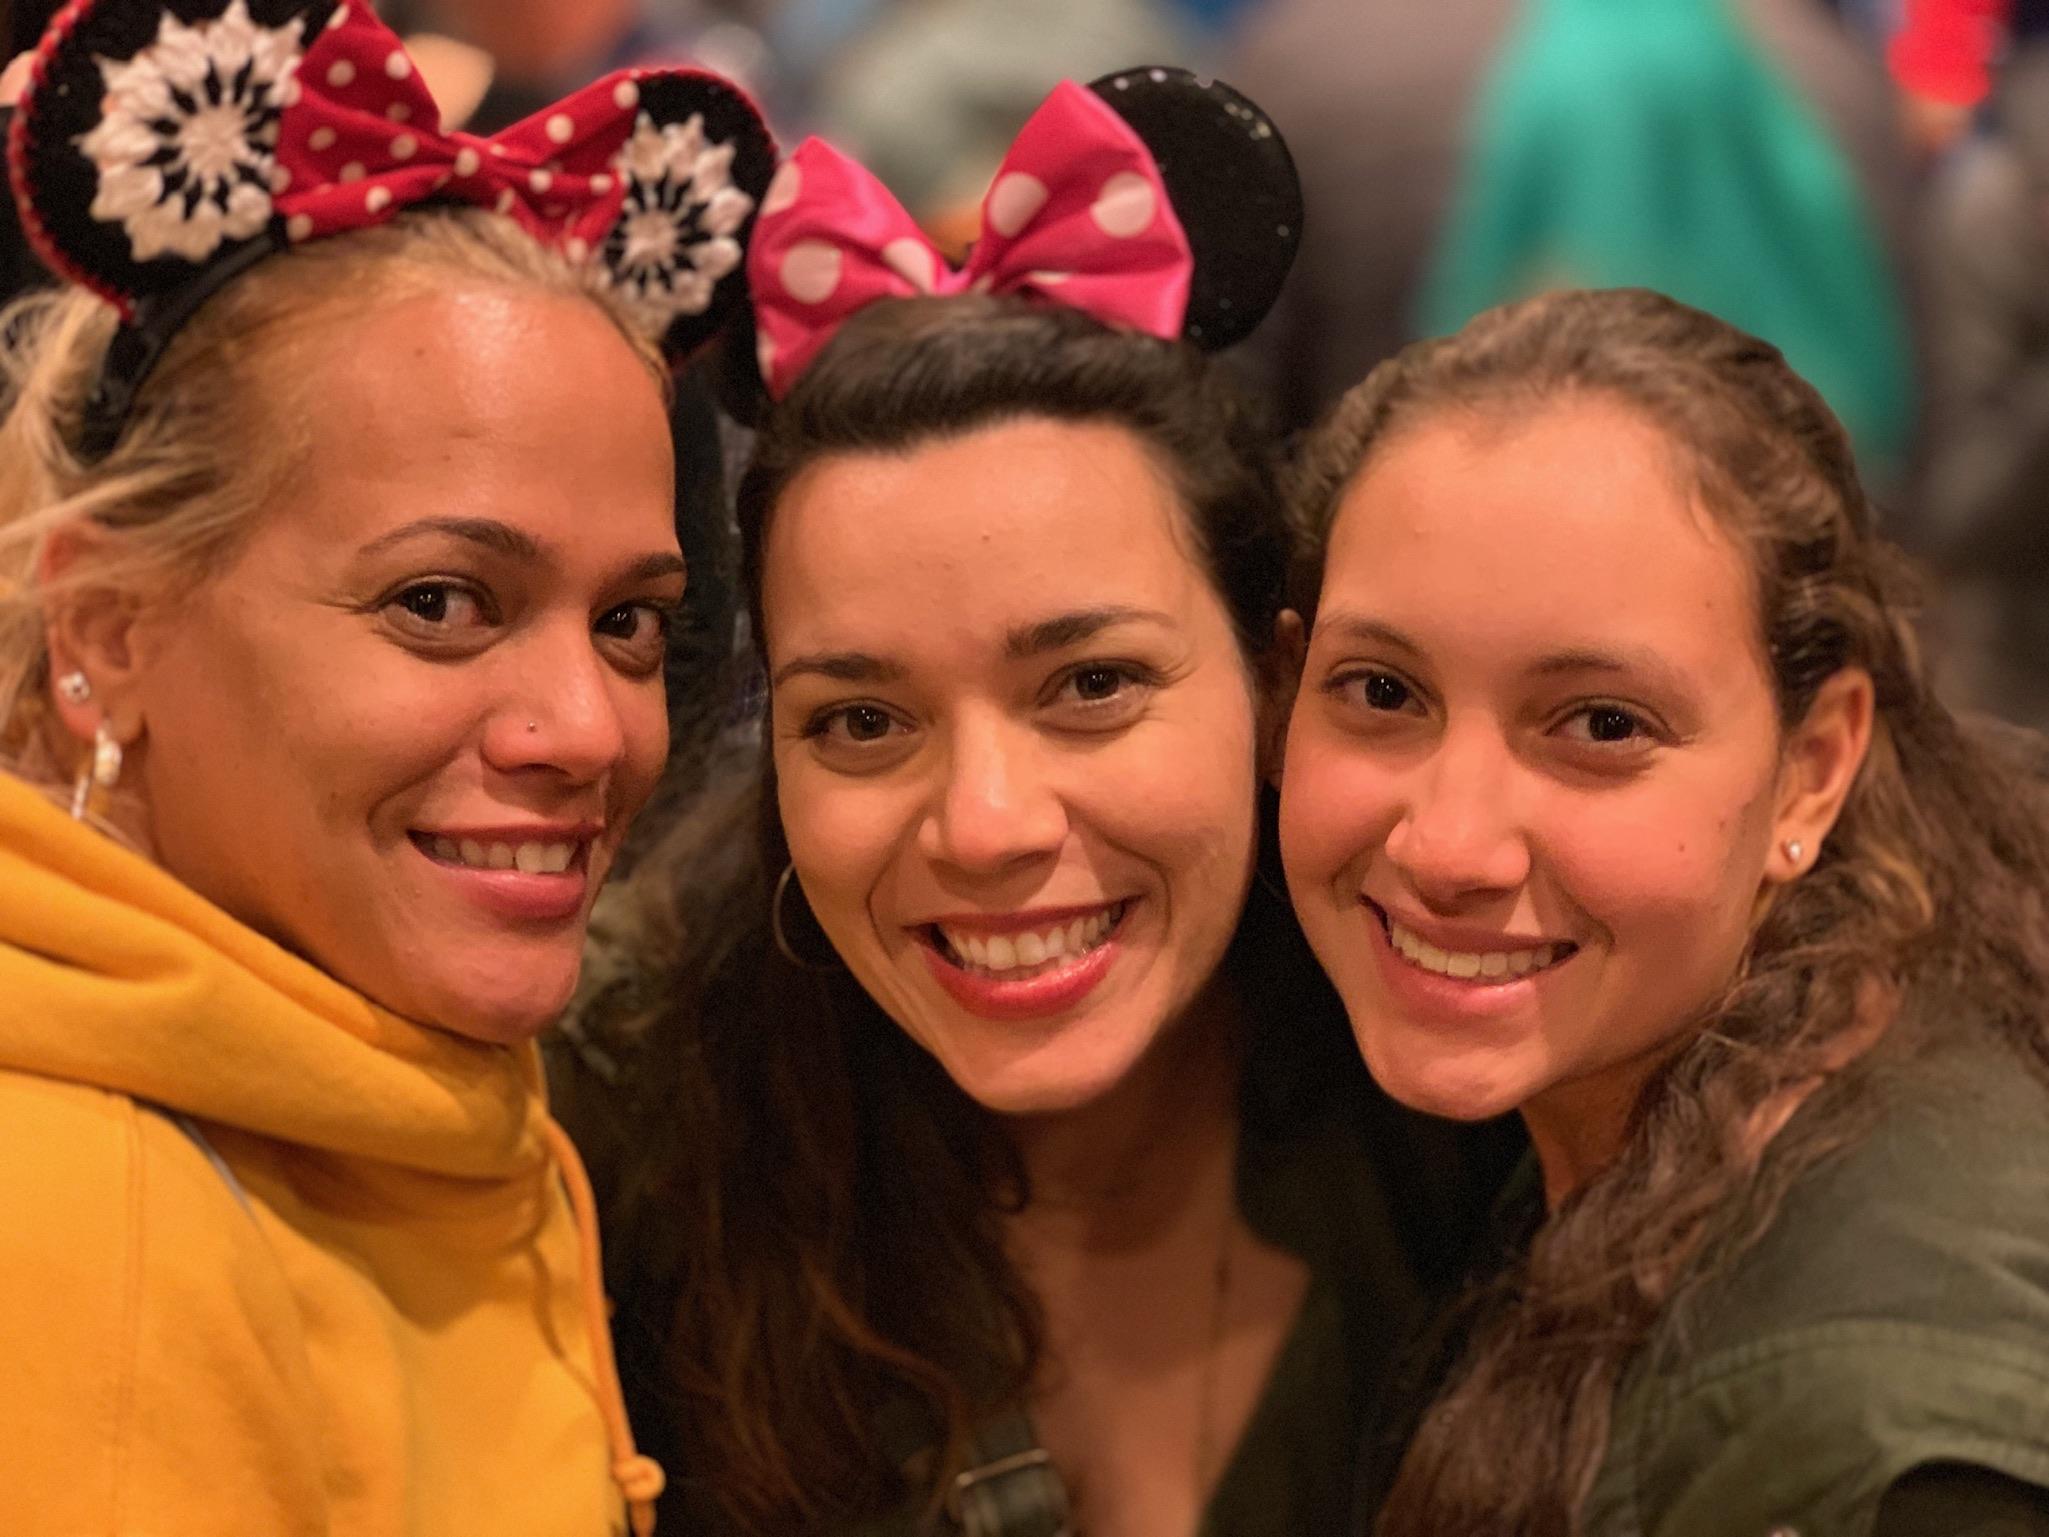 Prima hermanas - the three Felix cousins.